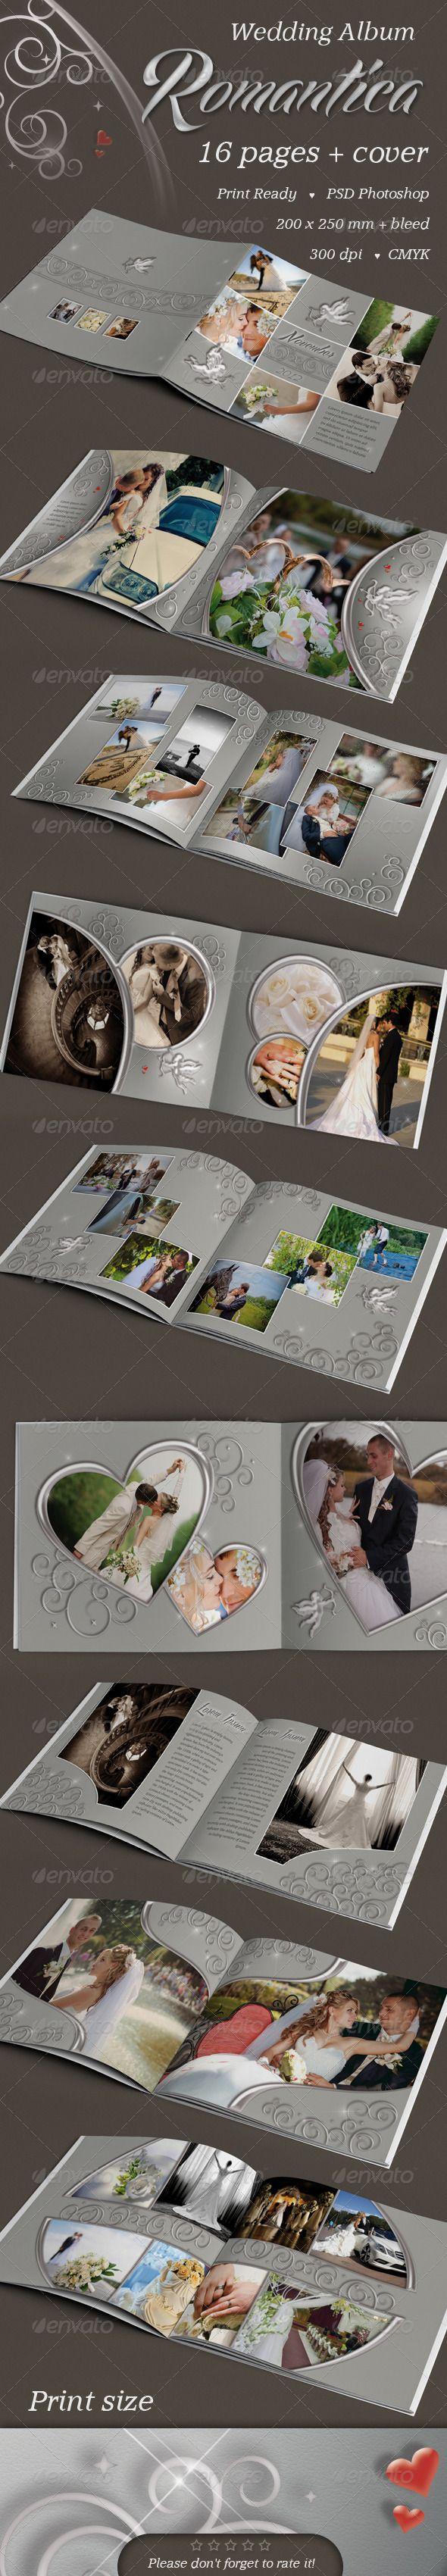 88 best Wedding Photo Album Template images on Pinterest | Photo ...